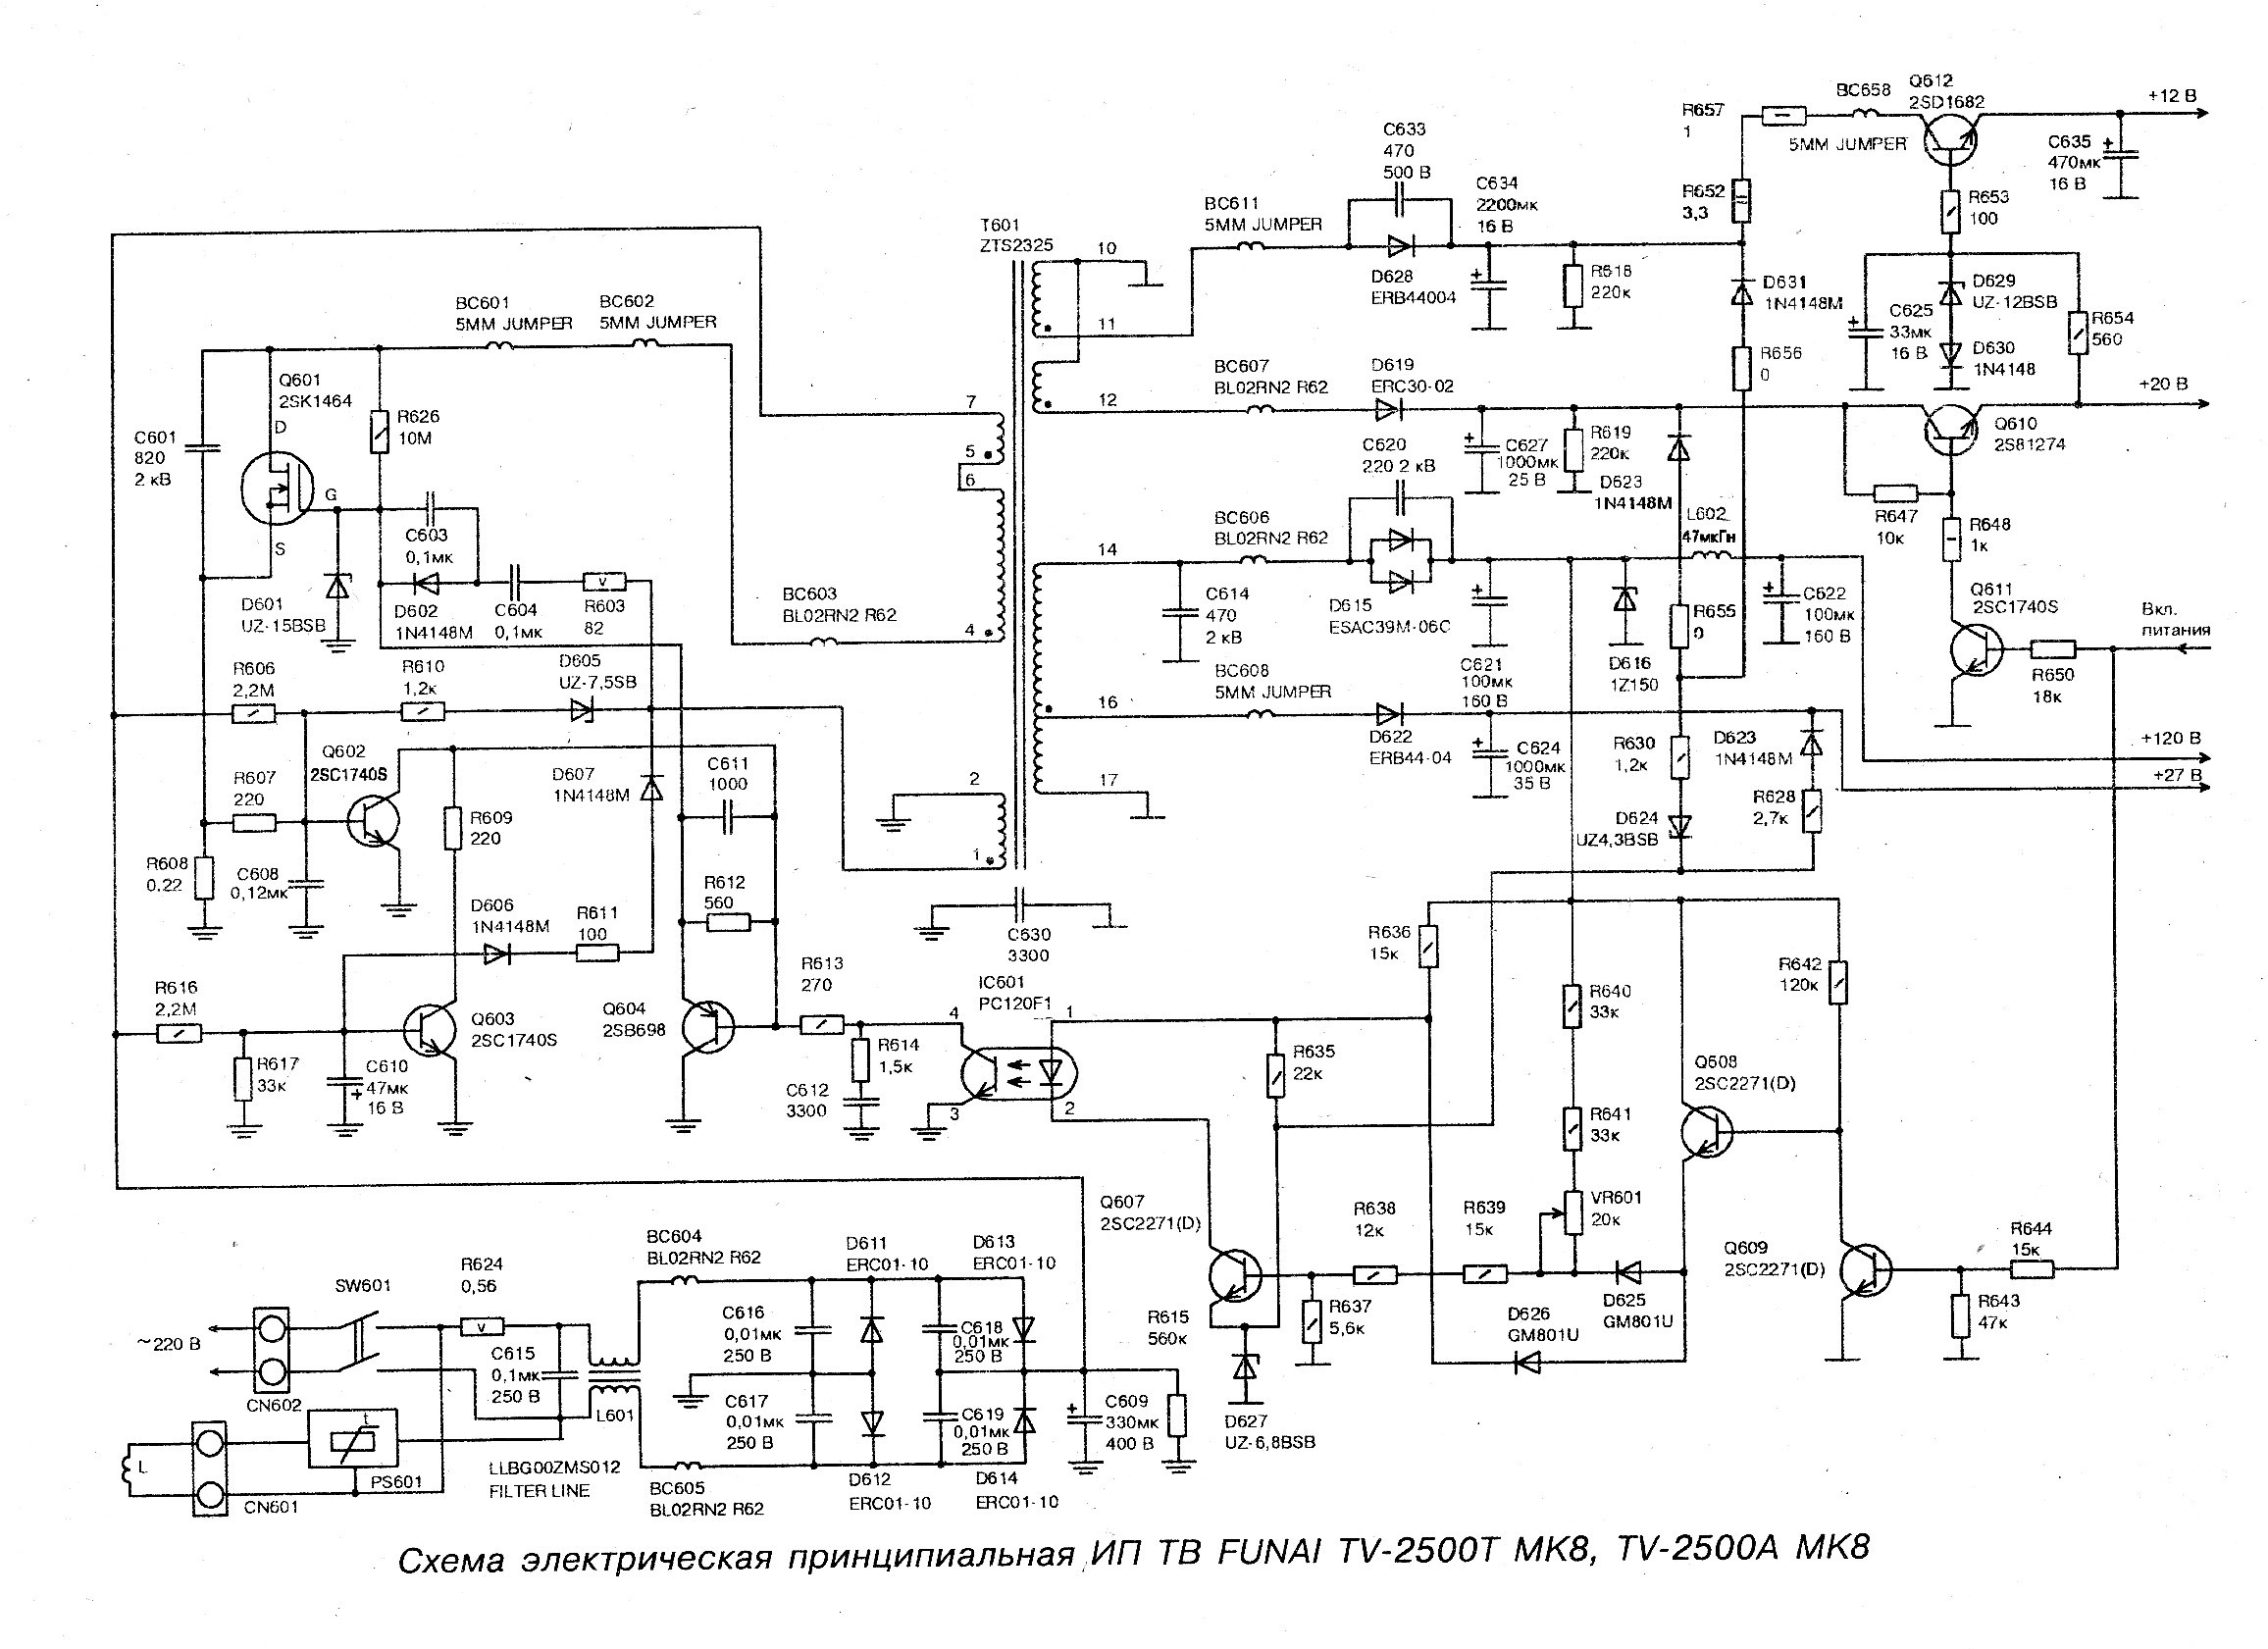 Блок питания sj-dv22a схема